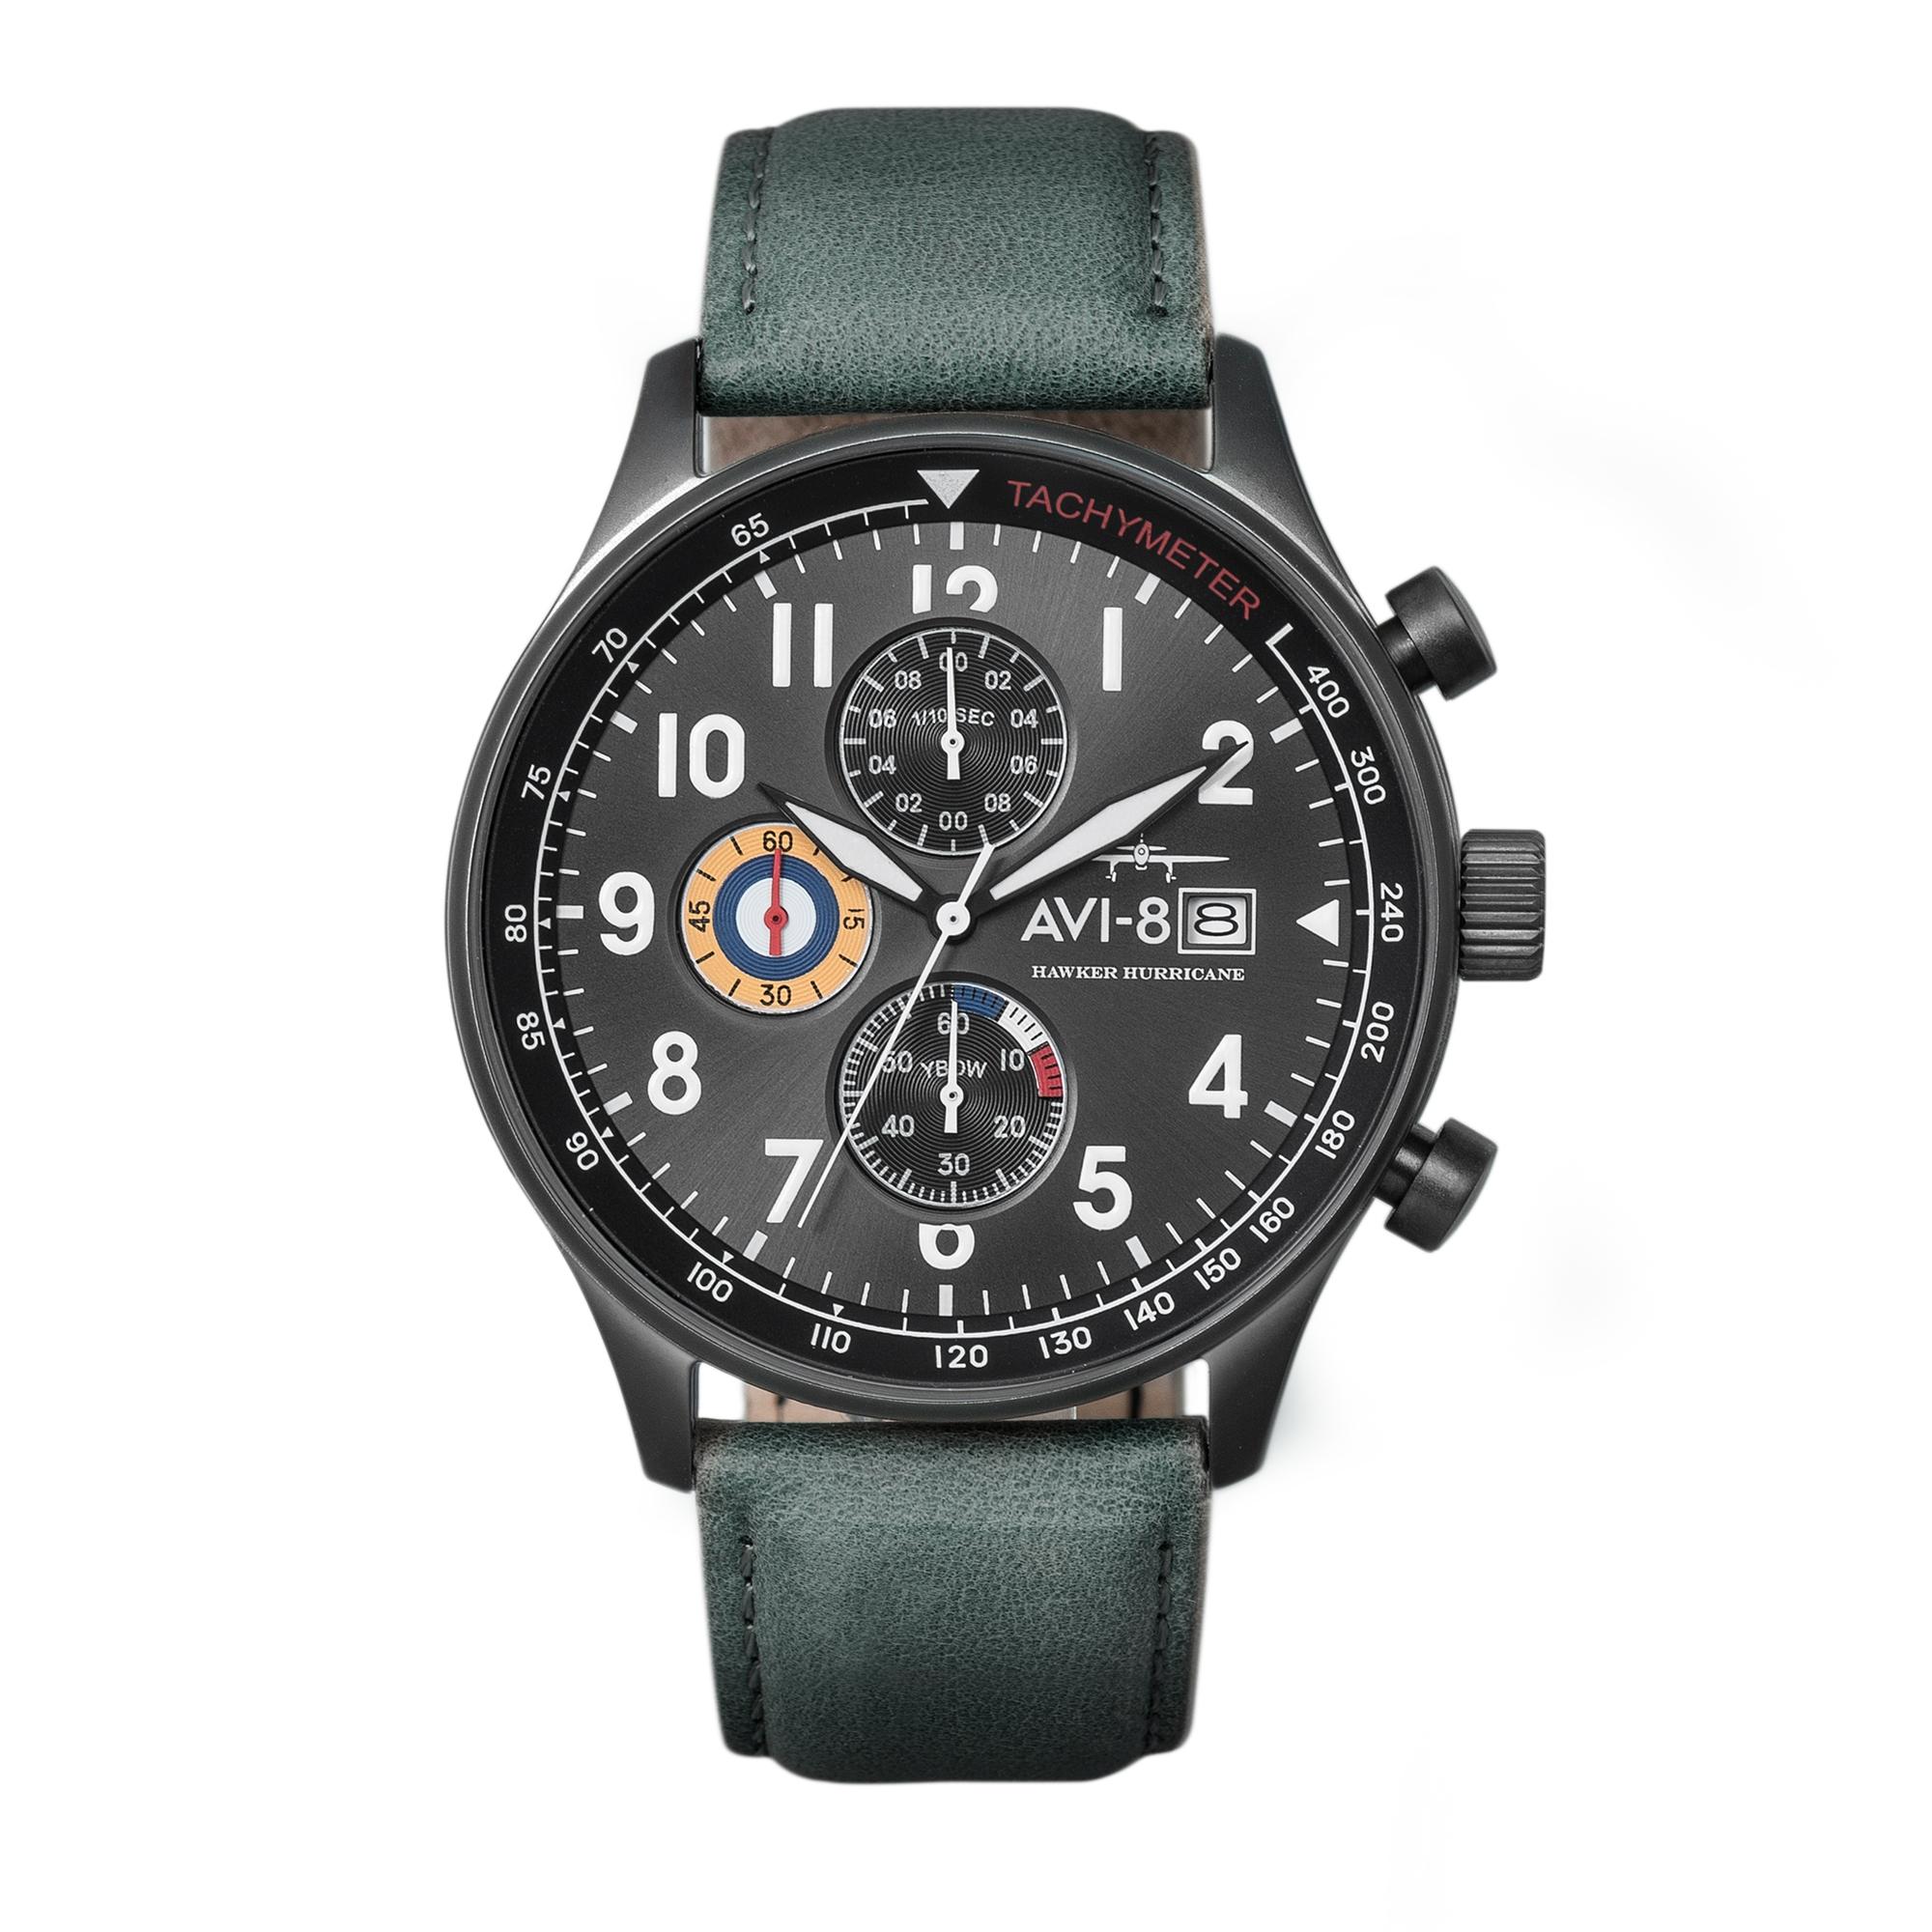 42MM Men's Hawker Hurricane Men's AVI-8 Military Green Watch